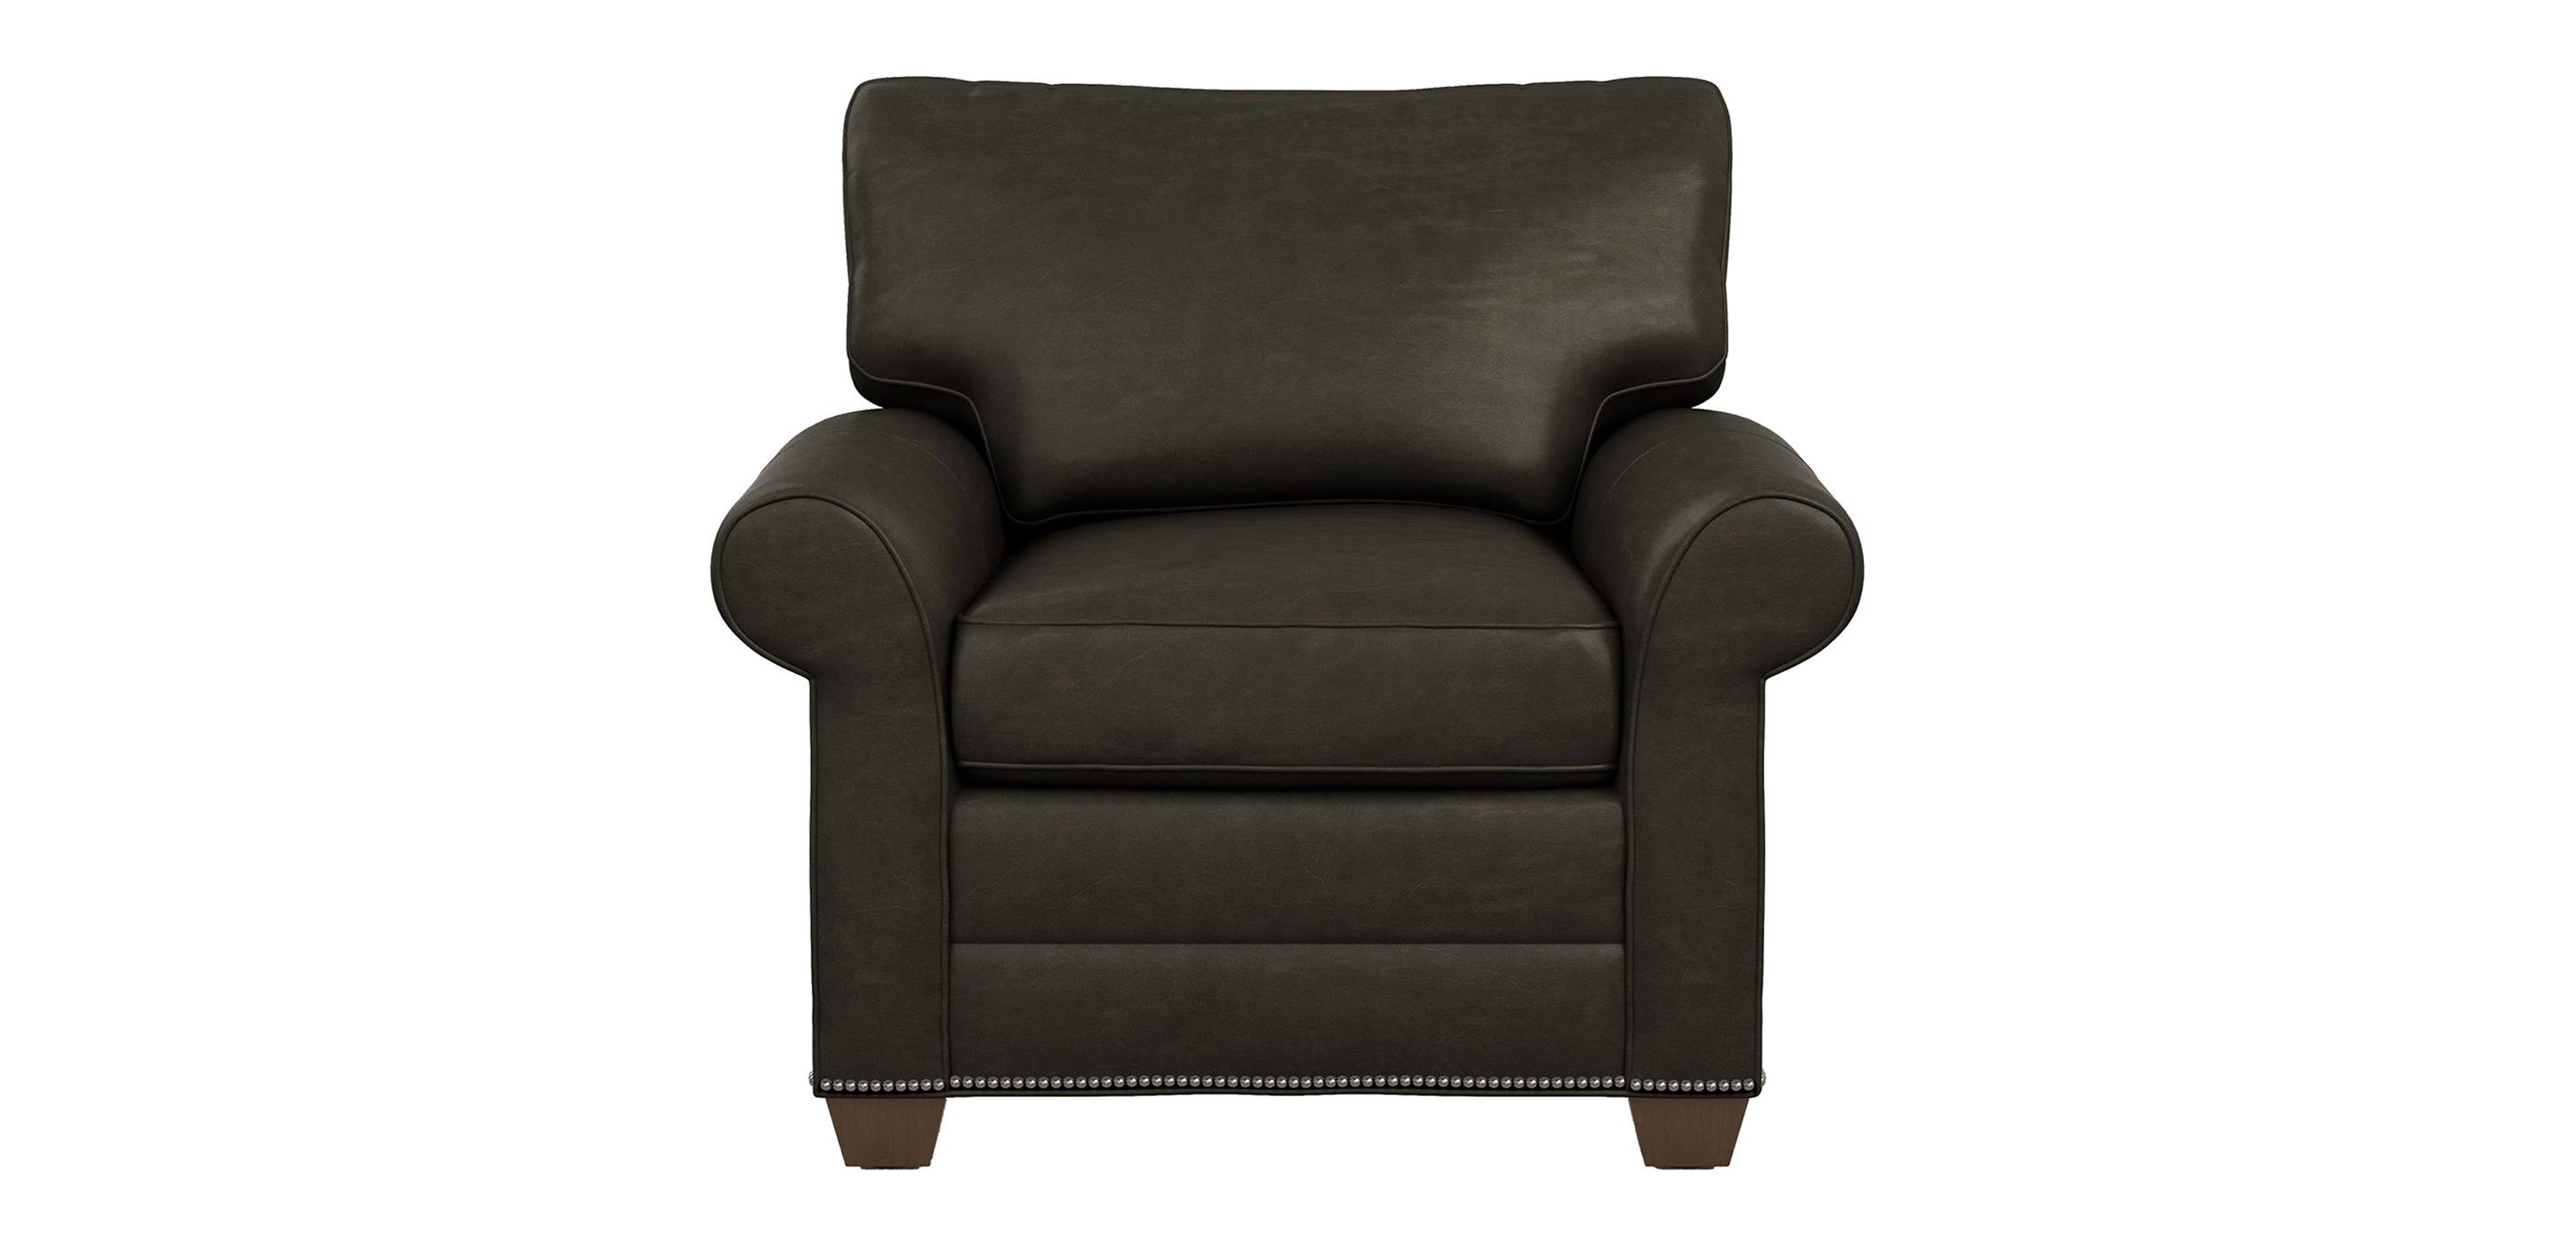 Bennett Roll Arm Leather Chair The Bennett Collection